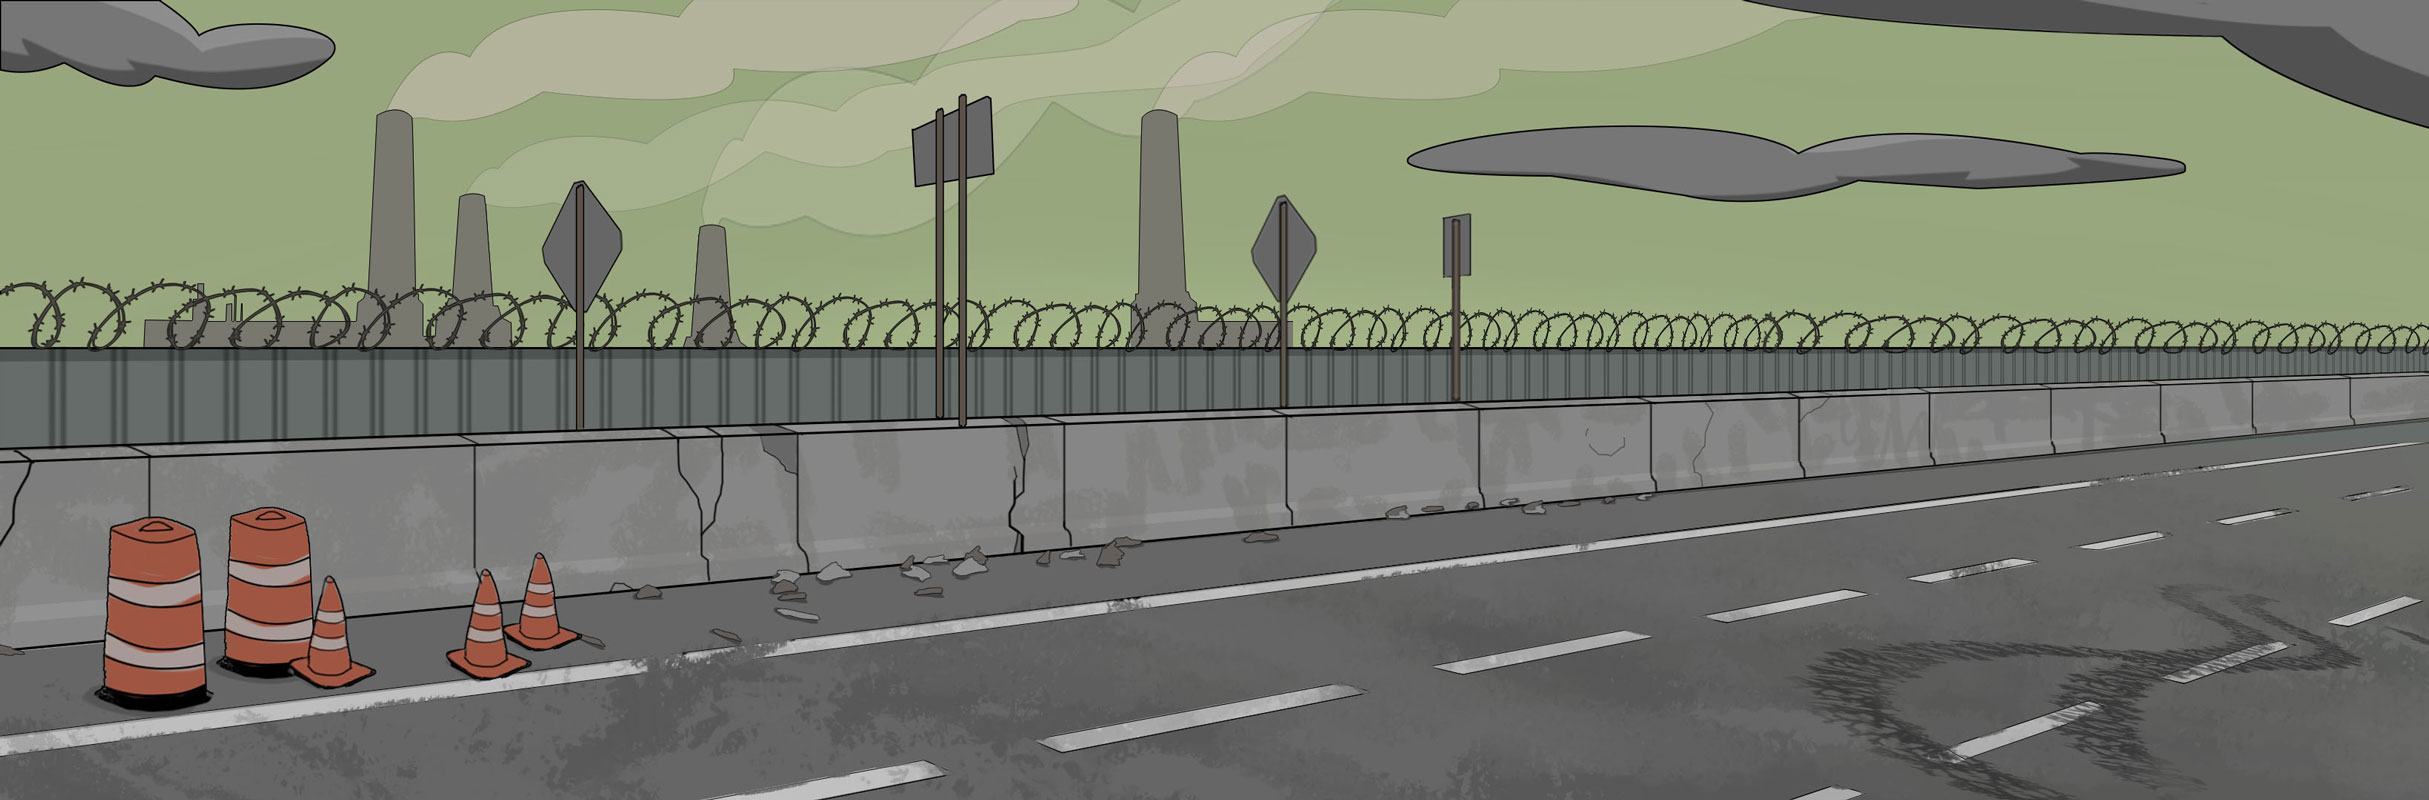 1_Freeway.jpg